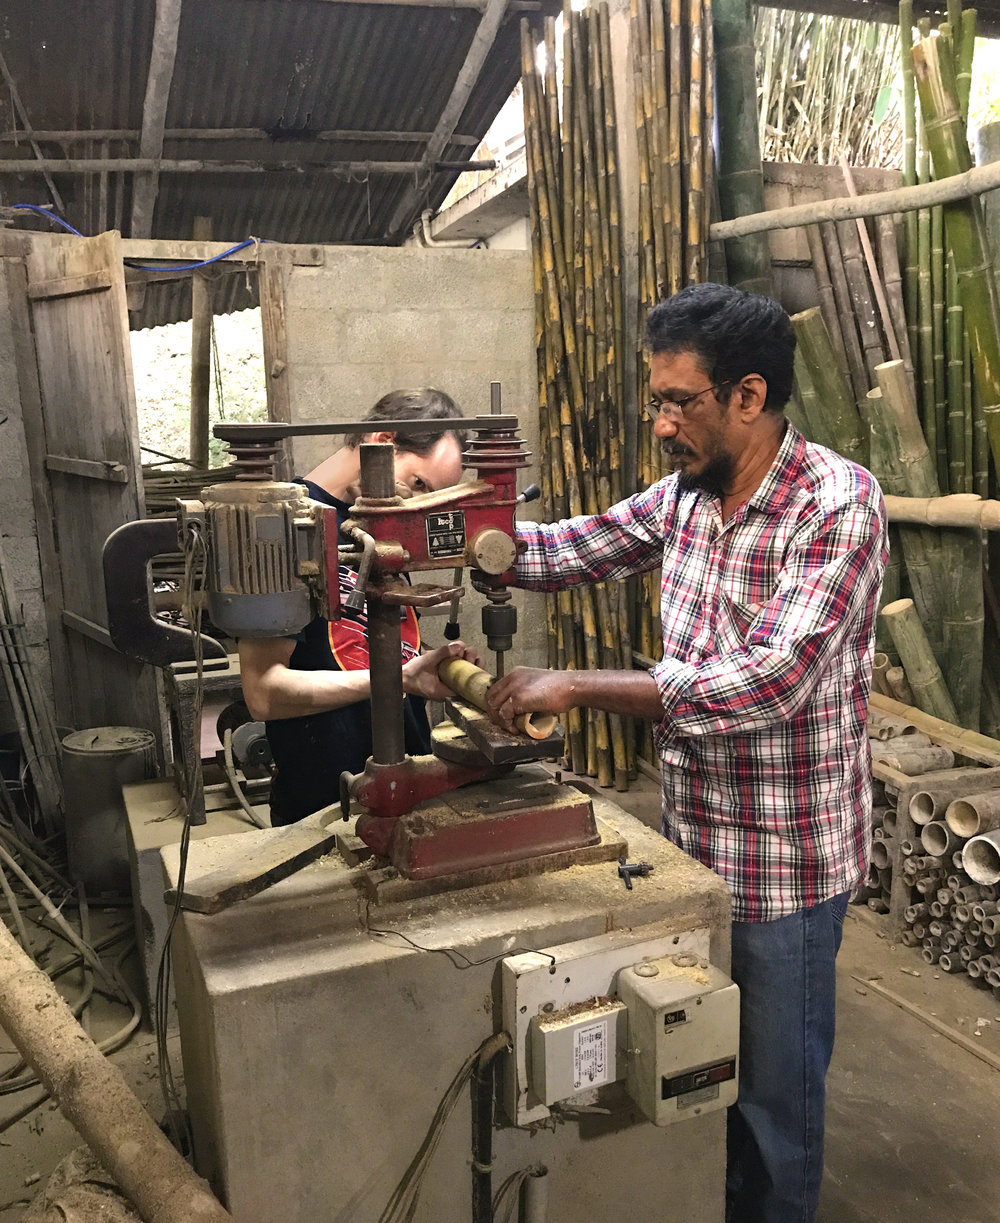 Bambo joinery workshop with Sadu.